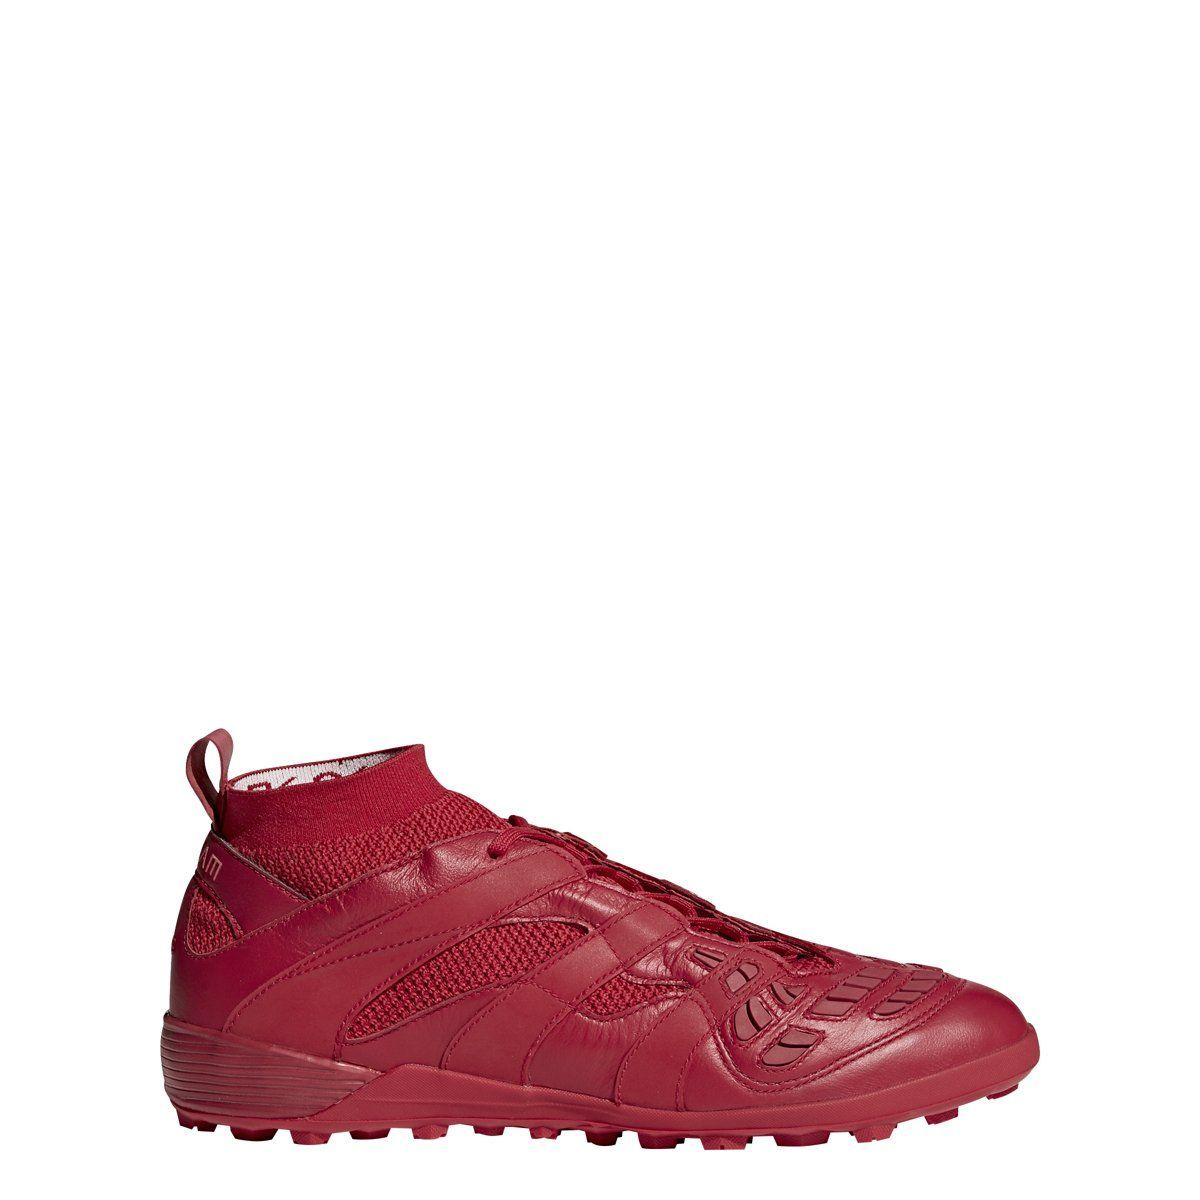 901aedde2144 adidas David Beckham DB Accelerator TF Men's Turf Shoes   Footwear ...